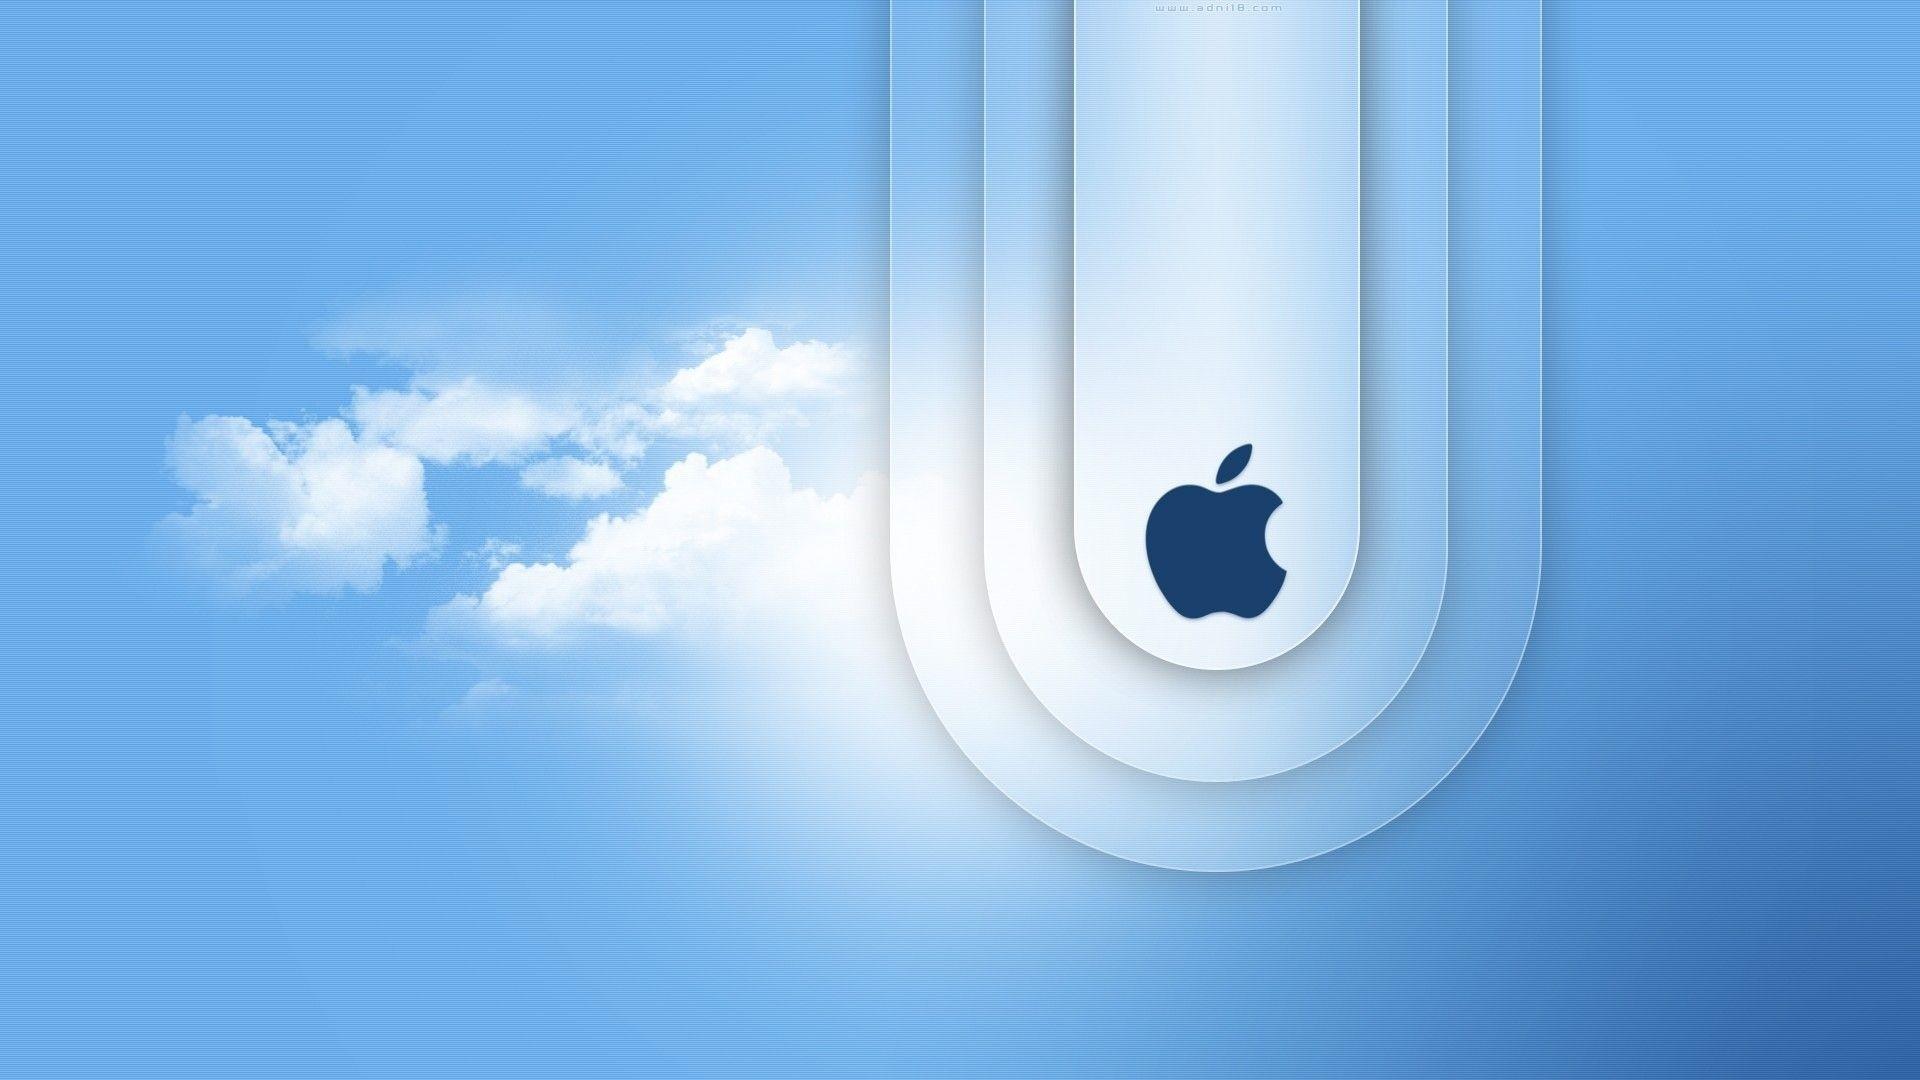 Macbook Air wallpaper photo hd